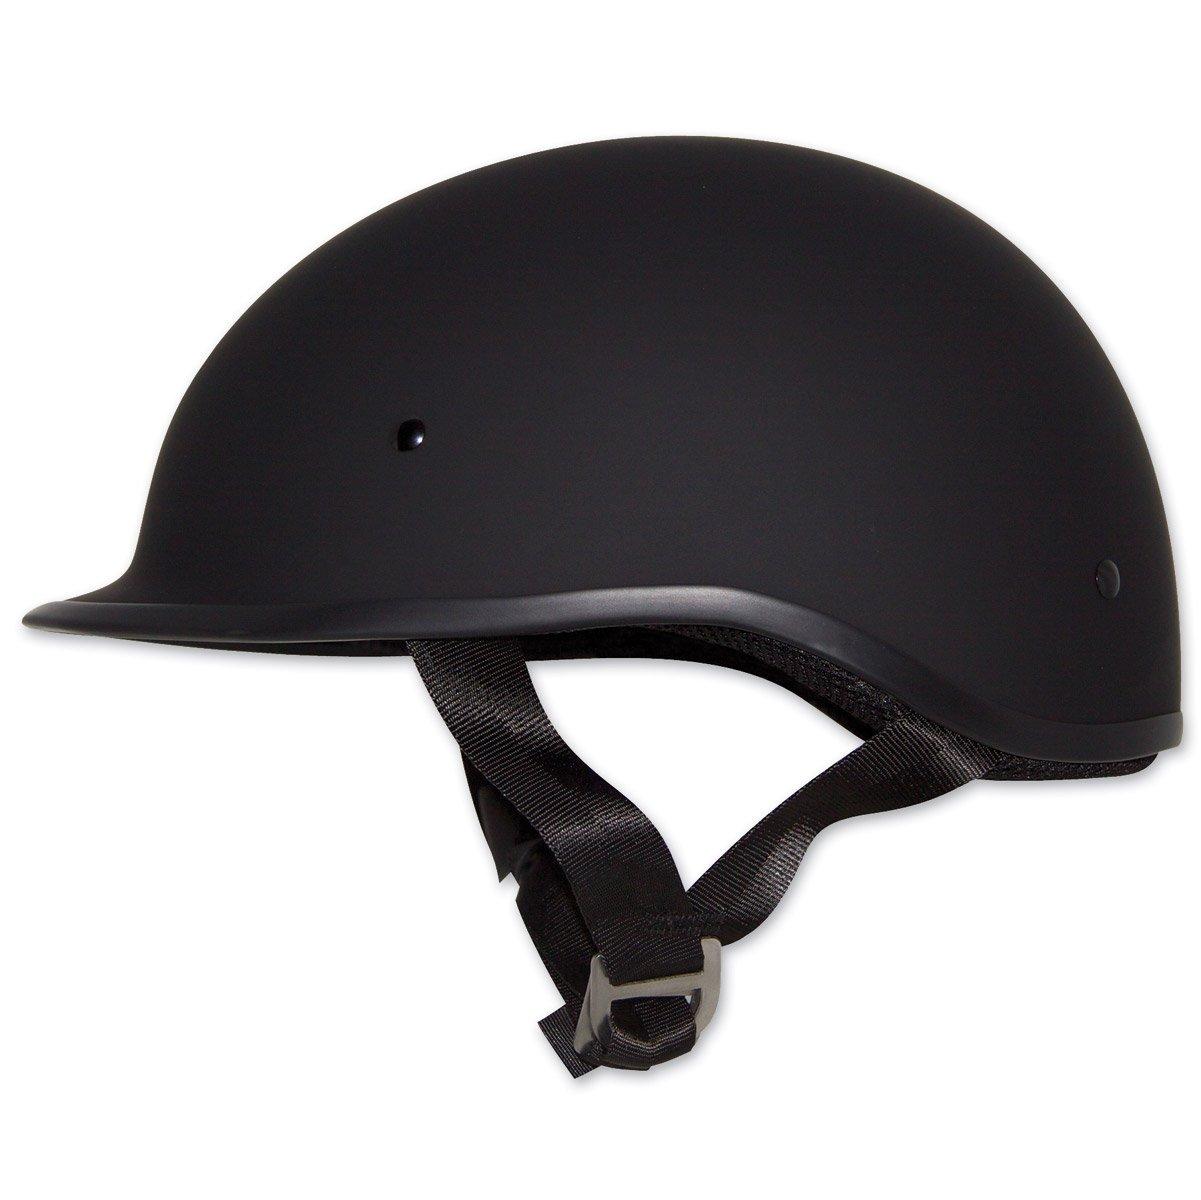 Zox Polo Sport Matte Black Half Helmet, M